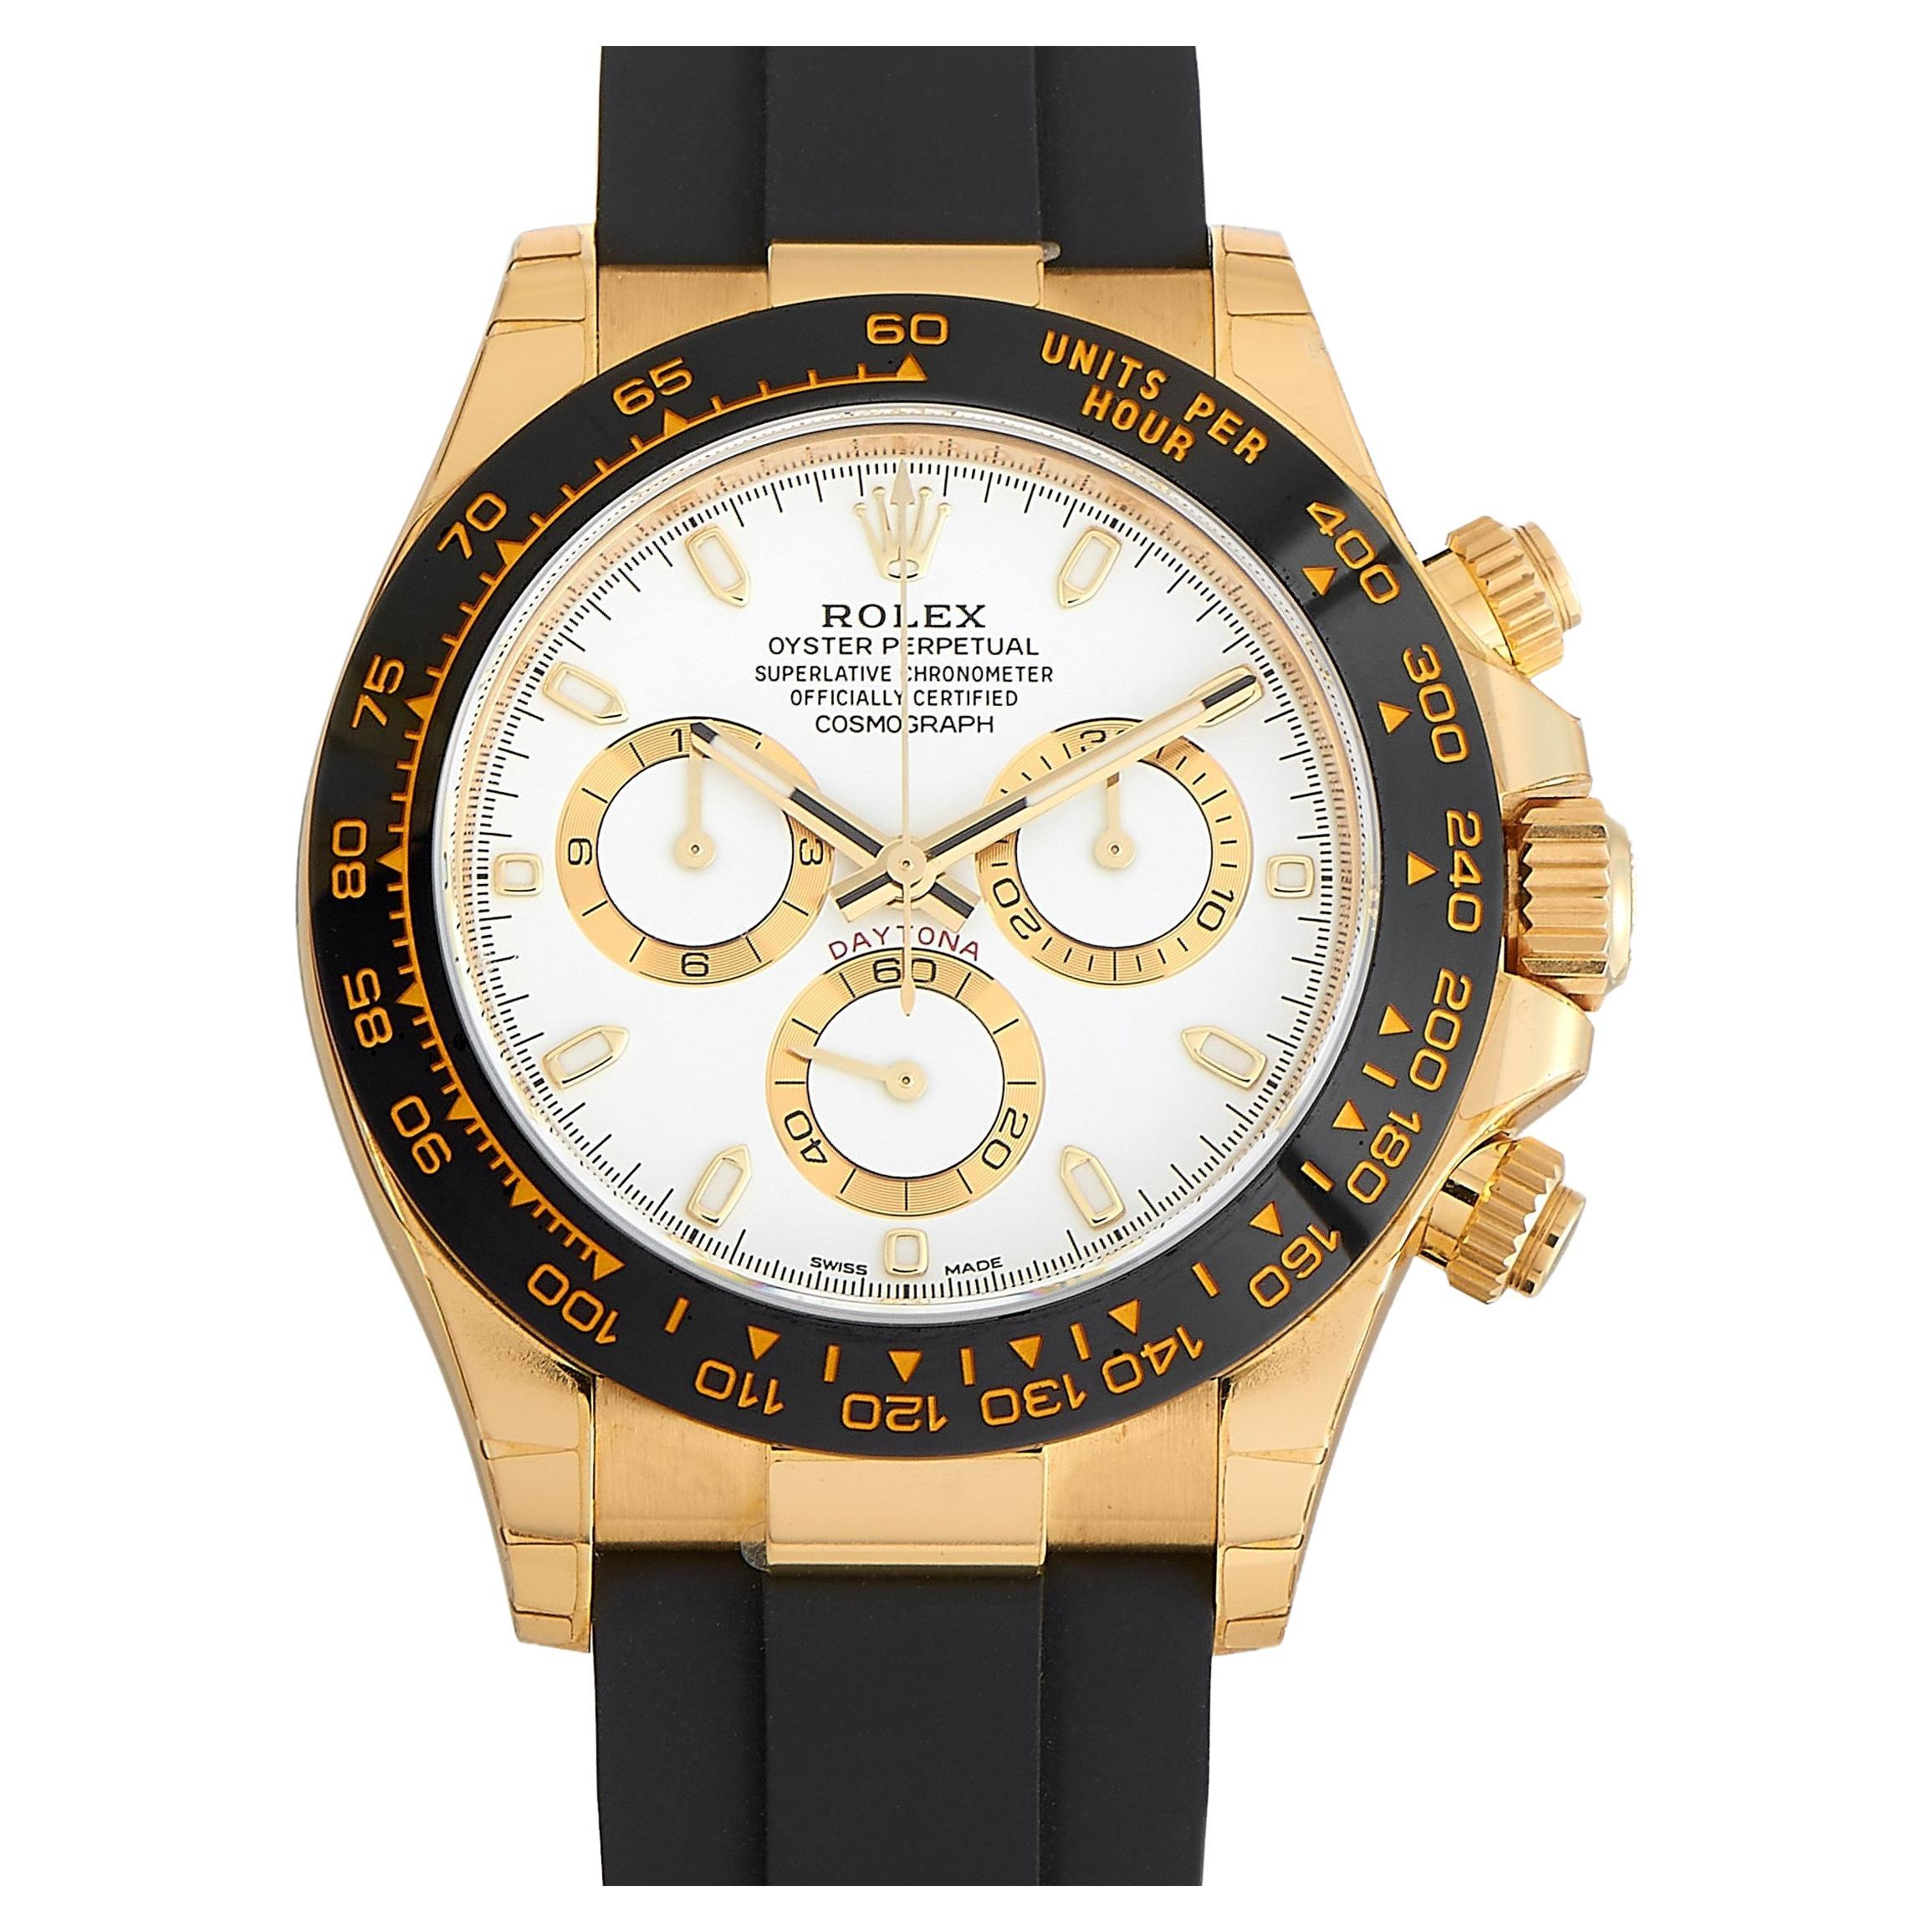 Rolex Cosmograph Daytona Yellow Gold Watch 116518LN-0041